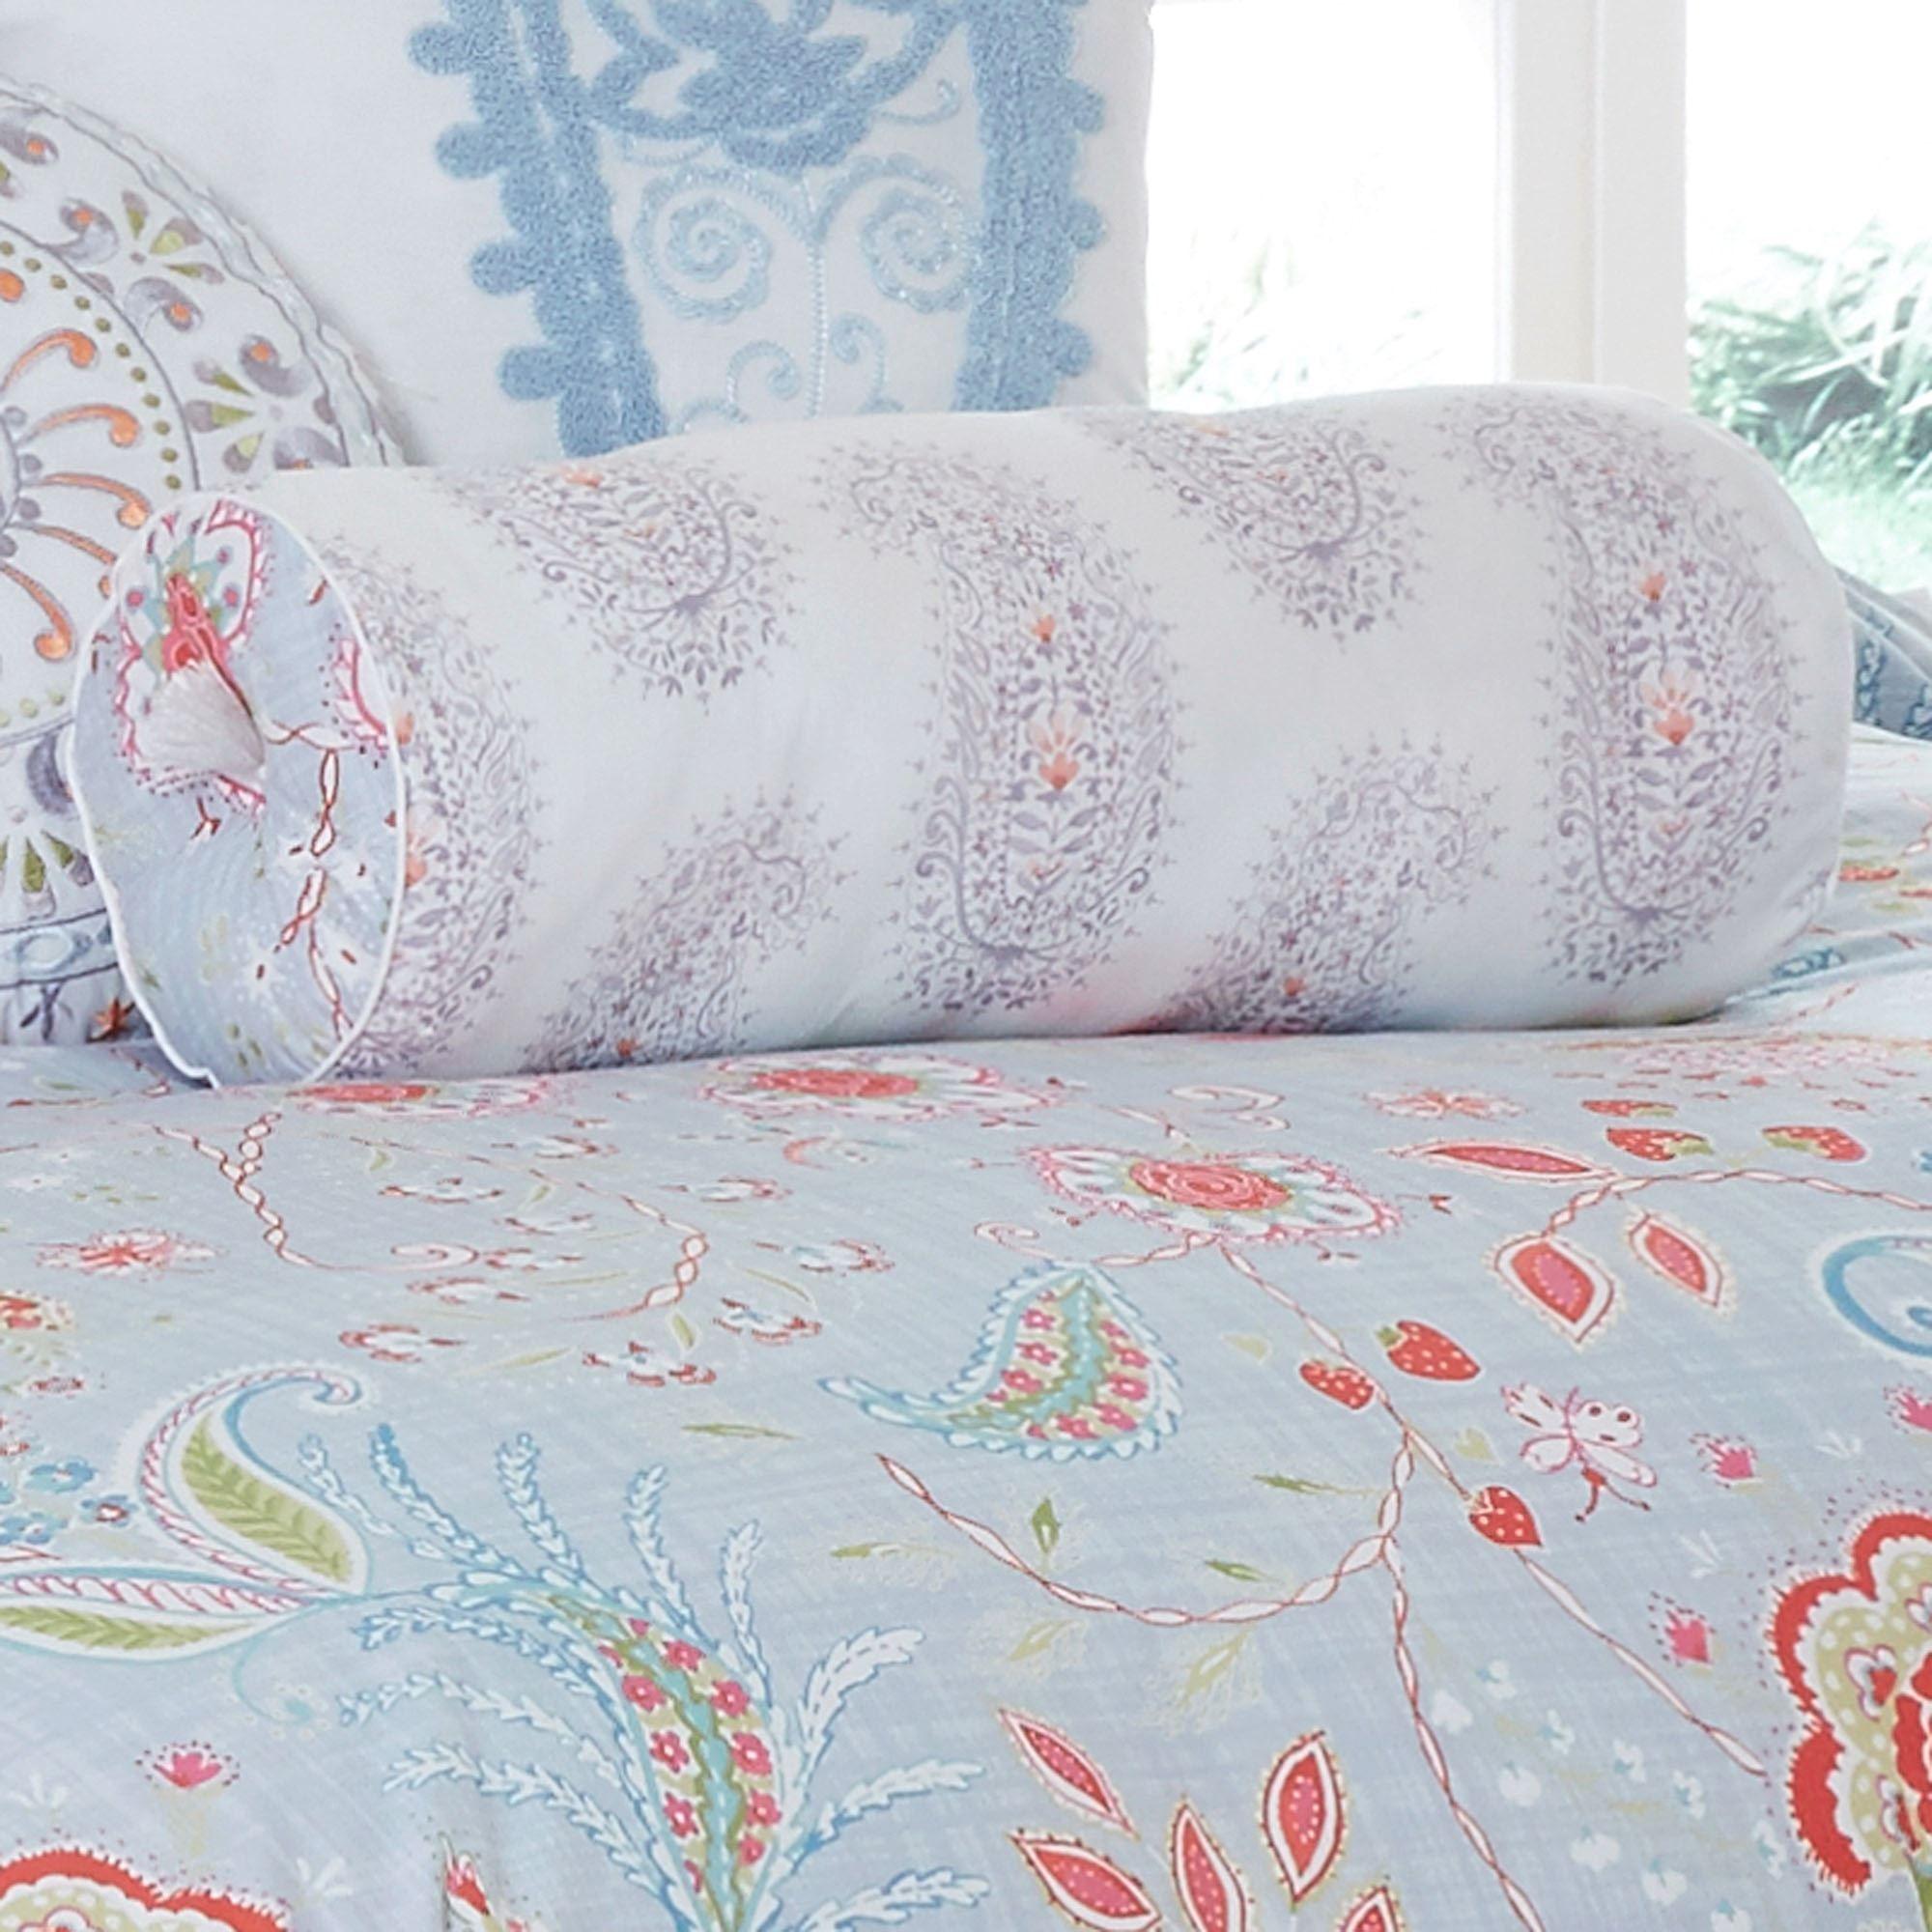 tapestry mandala gypsy pictures duvetover for size full awesome decorative comforter of celestial covers sensational duvet excellent bedding beddingvelvet bohemian and bedroom foiled concept velvet